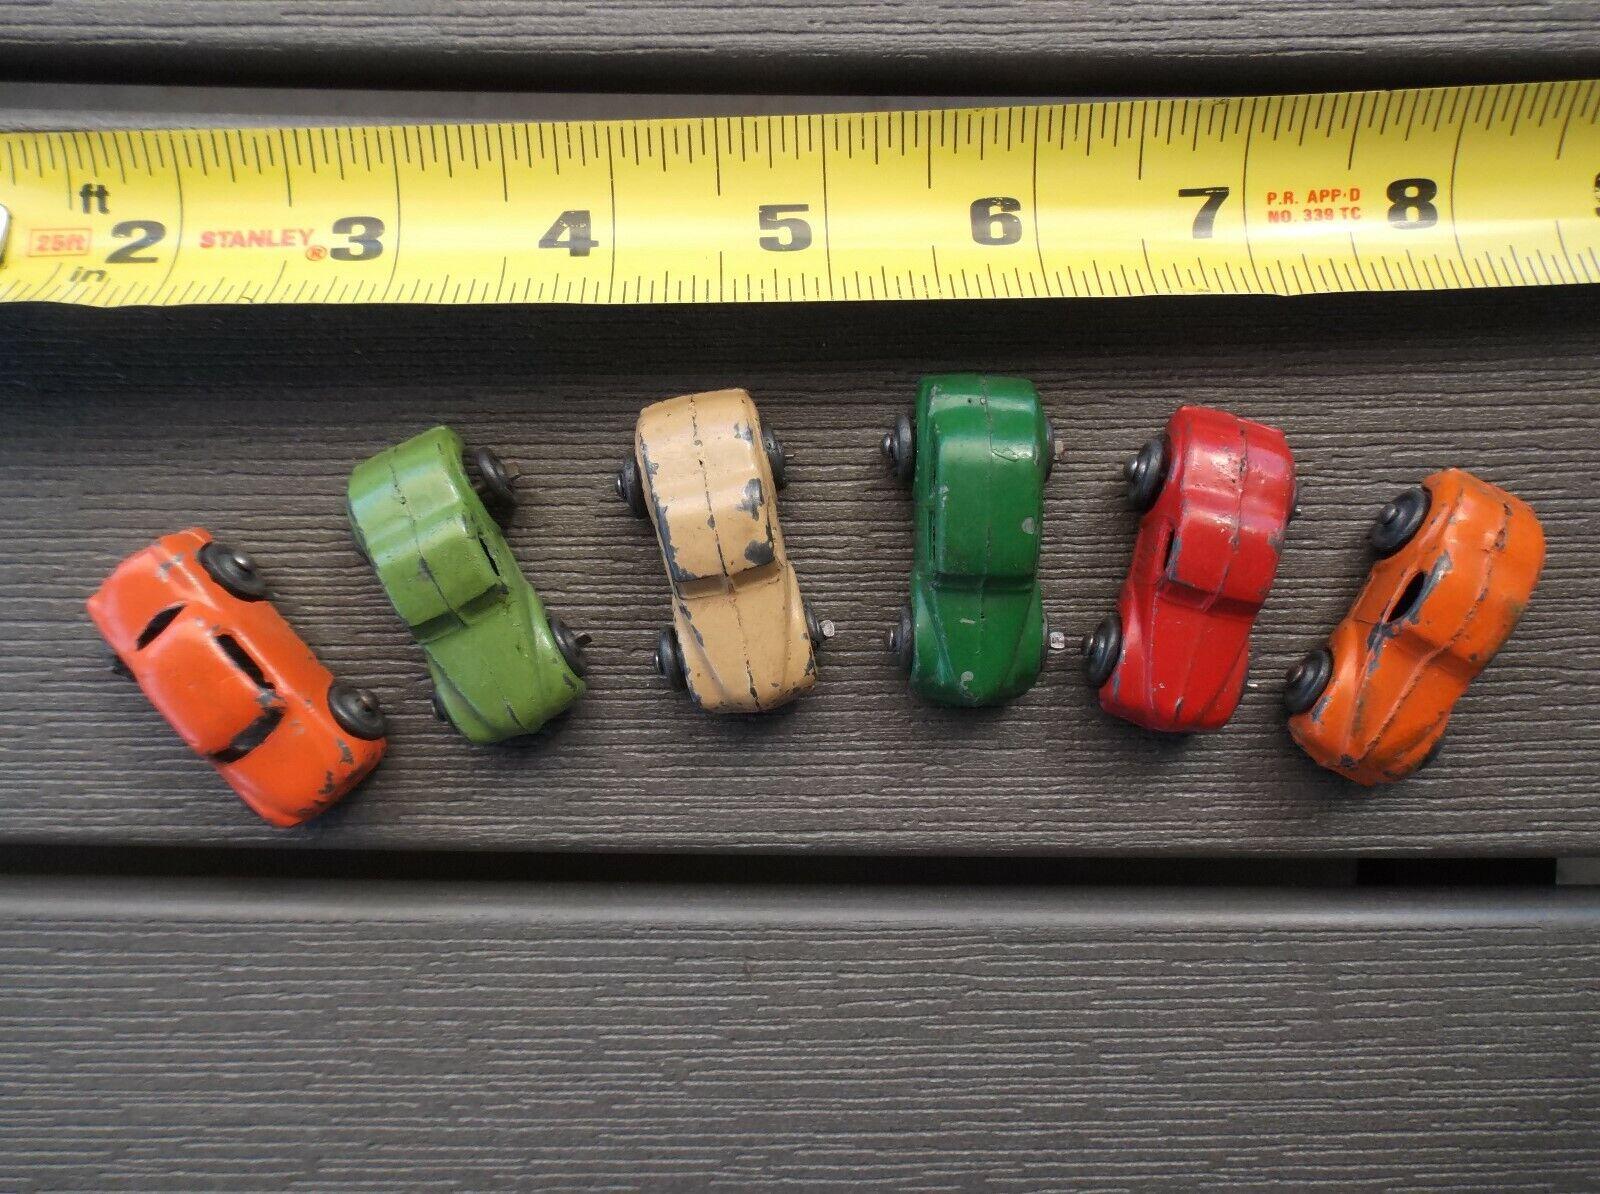 VINTAGE DIE CAST MINIATURE TOY CARS -- RARE!